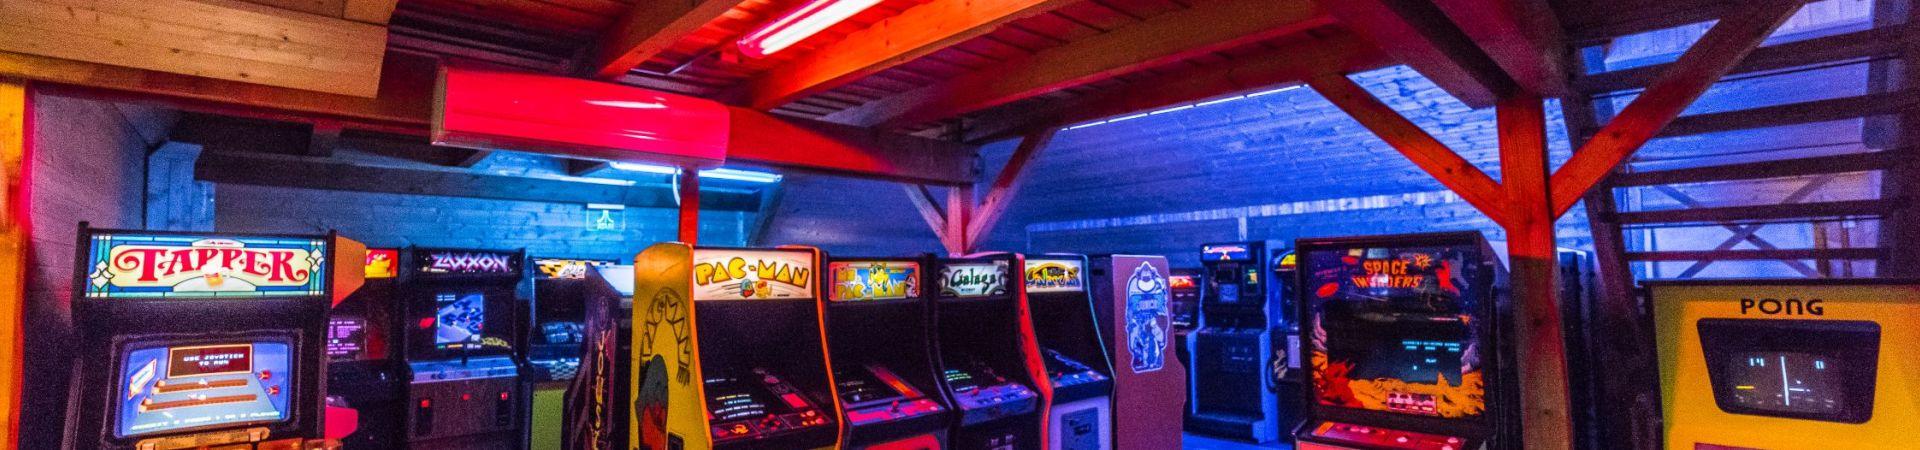 Arcade Hry